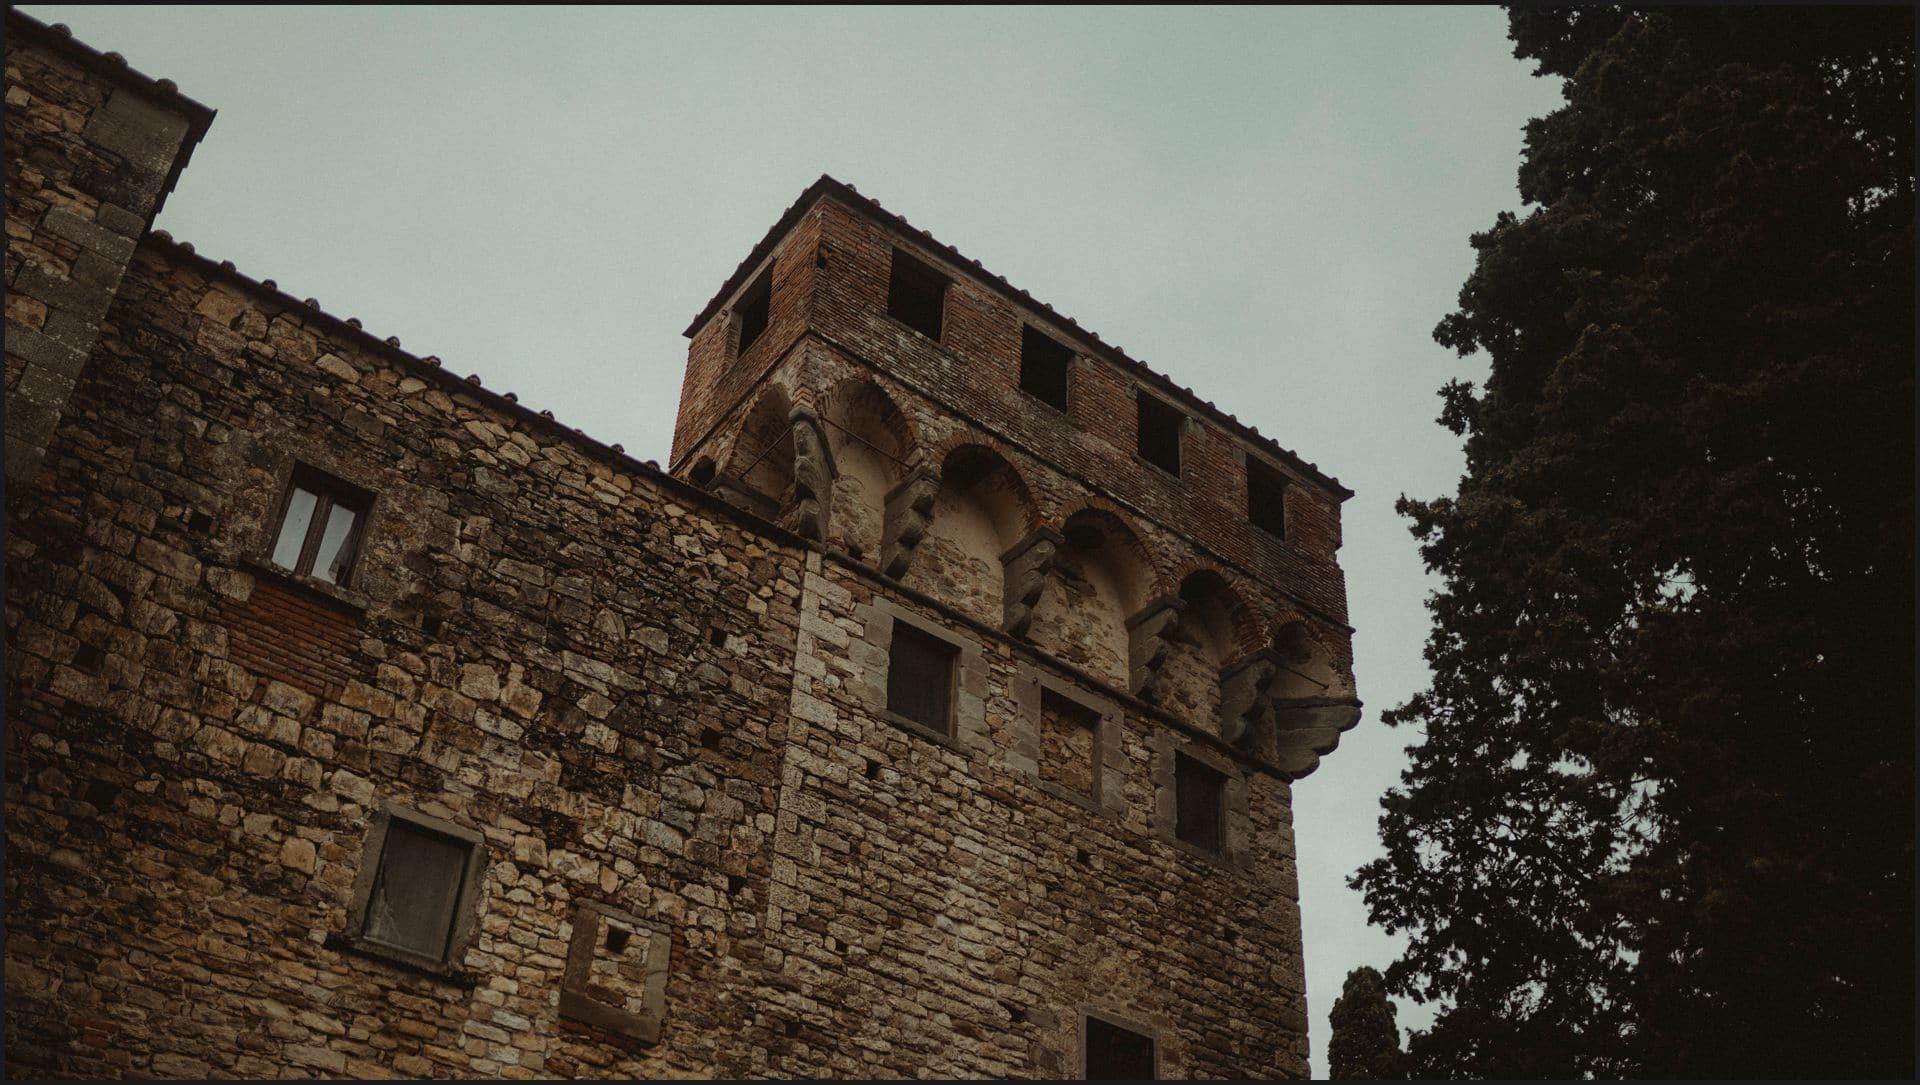 destination wedding, castello del trebbio, tuscany, castle, medieval